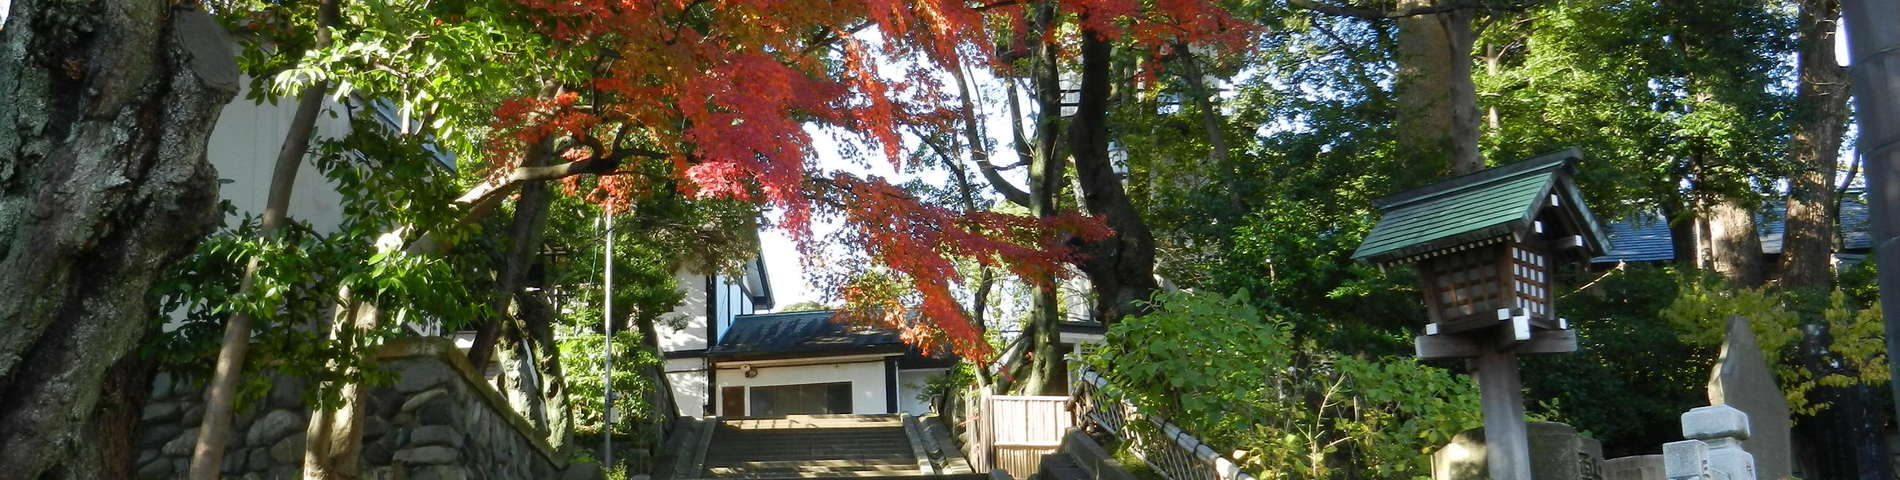 Yokohama International Education Academy 사진 1